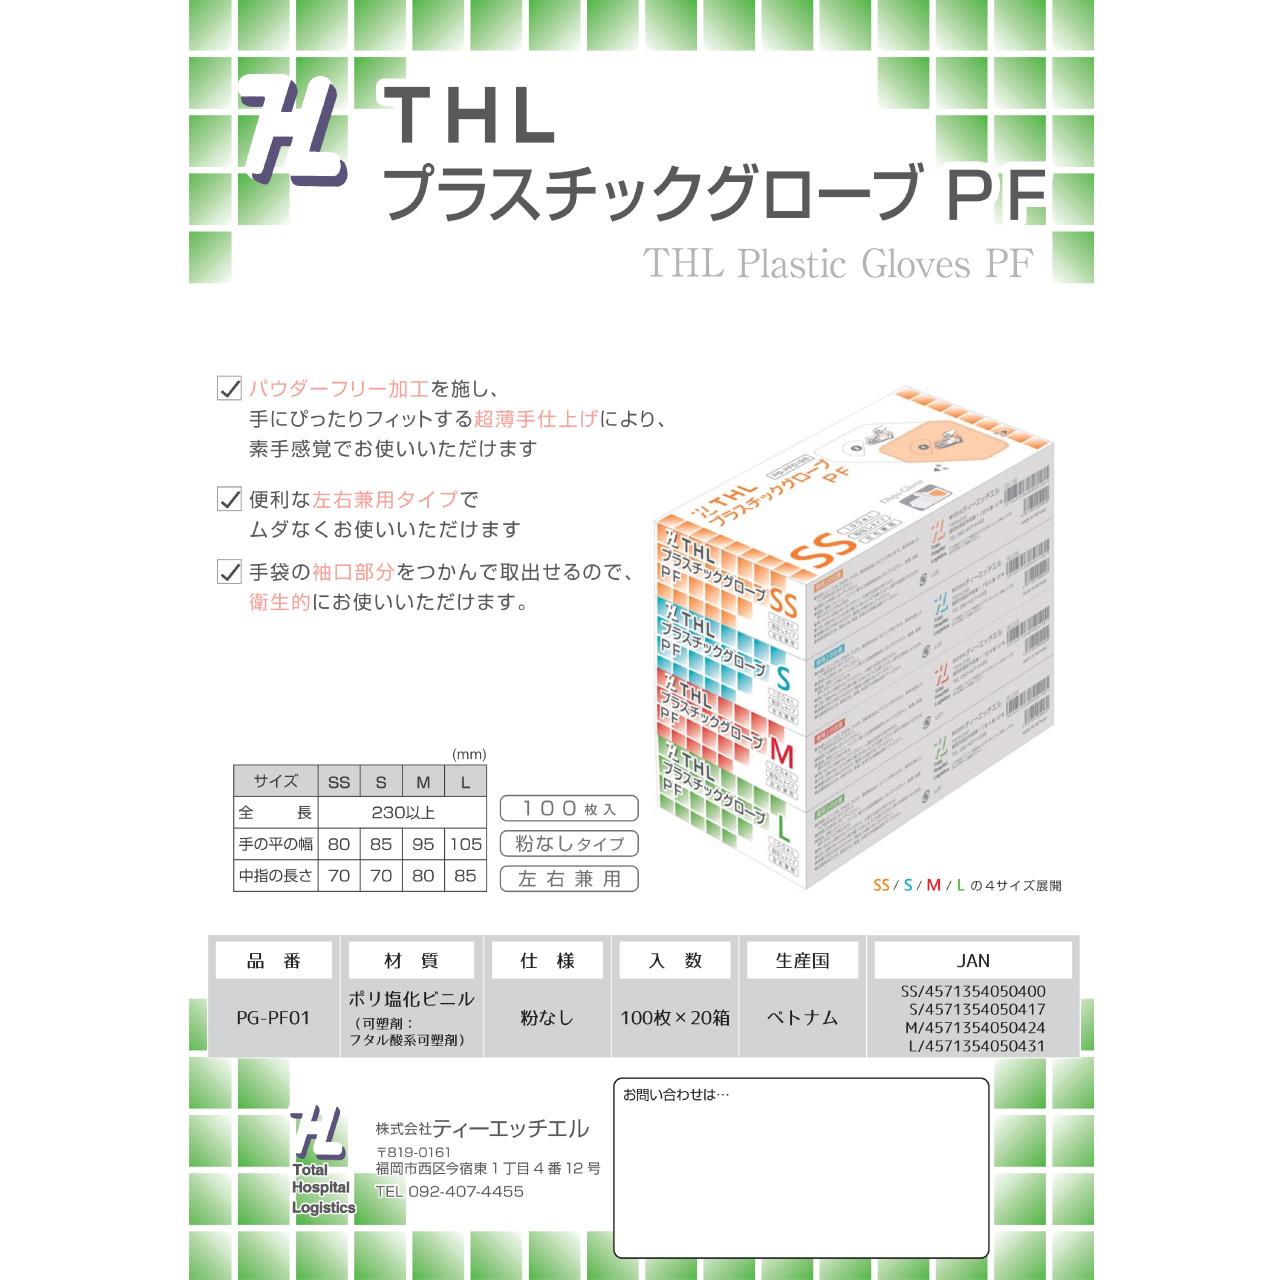 THLプラスチックグローブPF